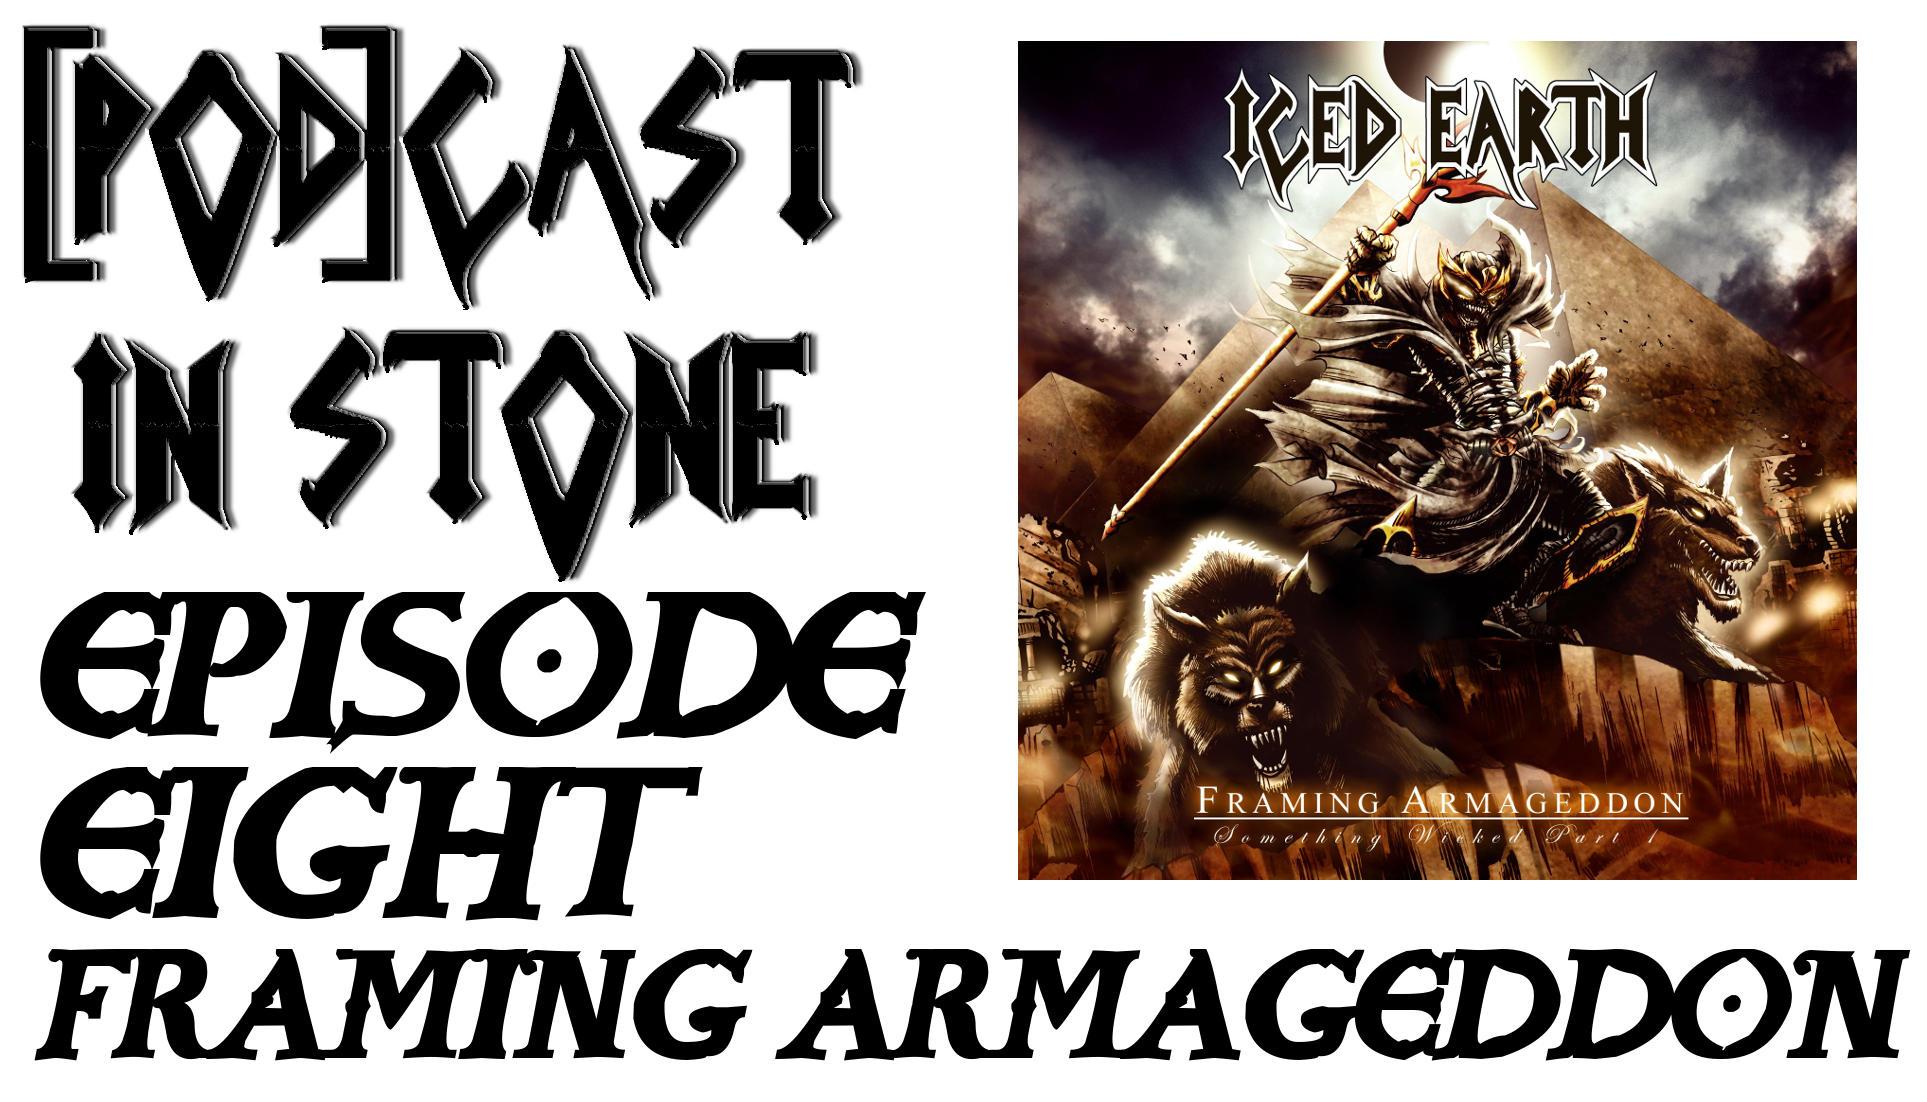 Pod]Cast In Stone - Episode 8: Framing Armageddon